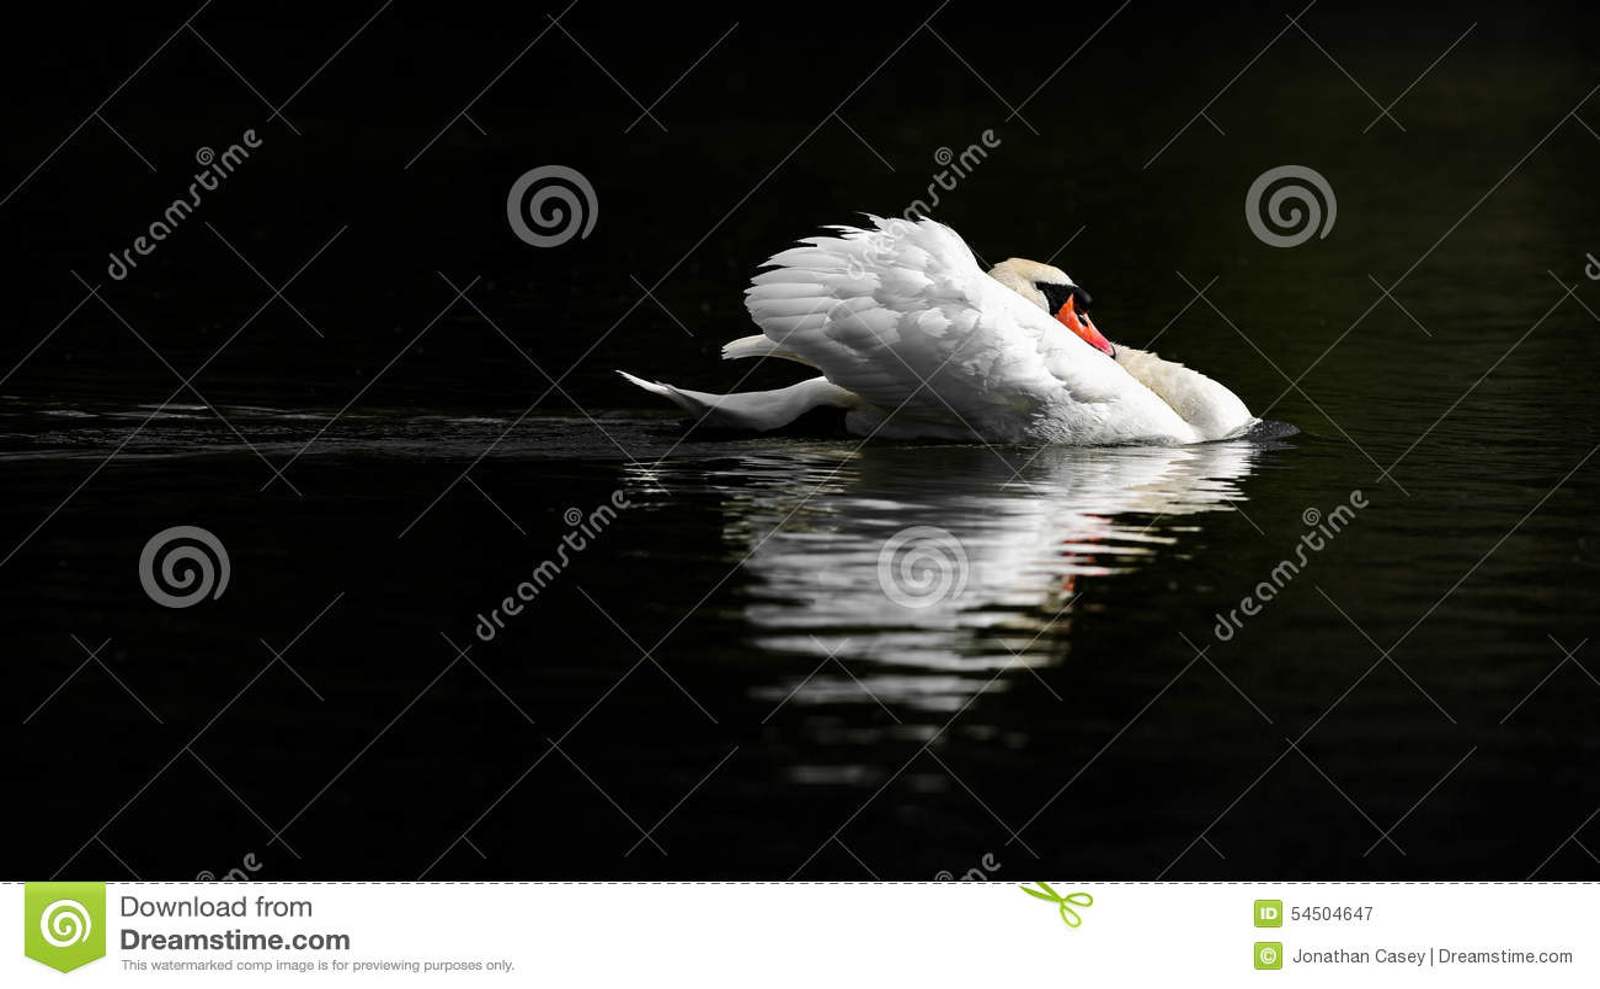 Male Mute Swan in Threat Posture on Dark Water